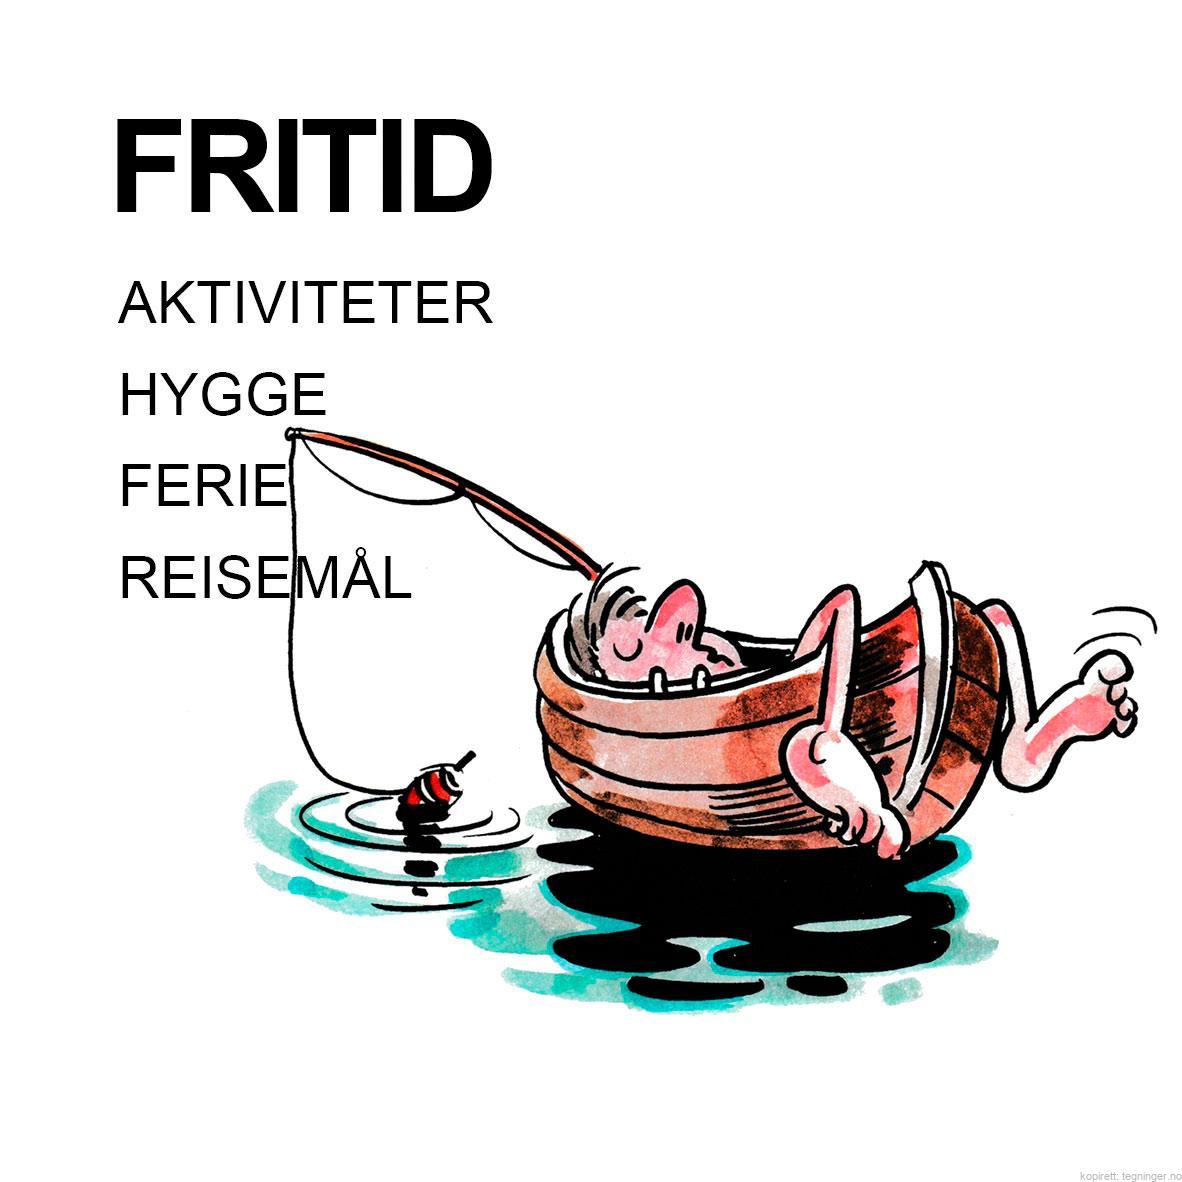 FRITID